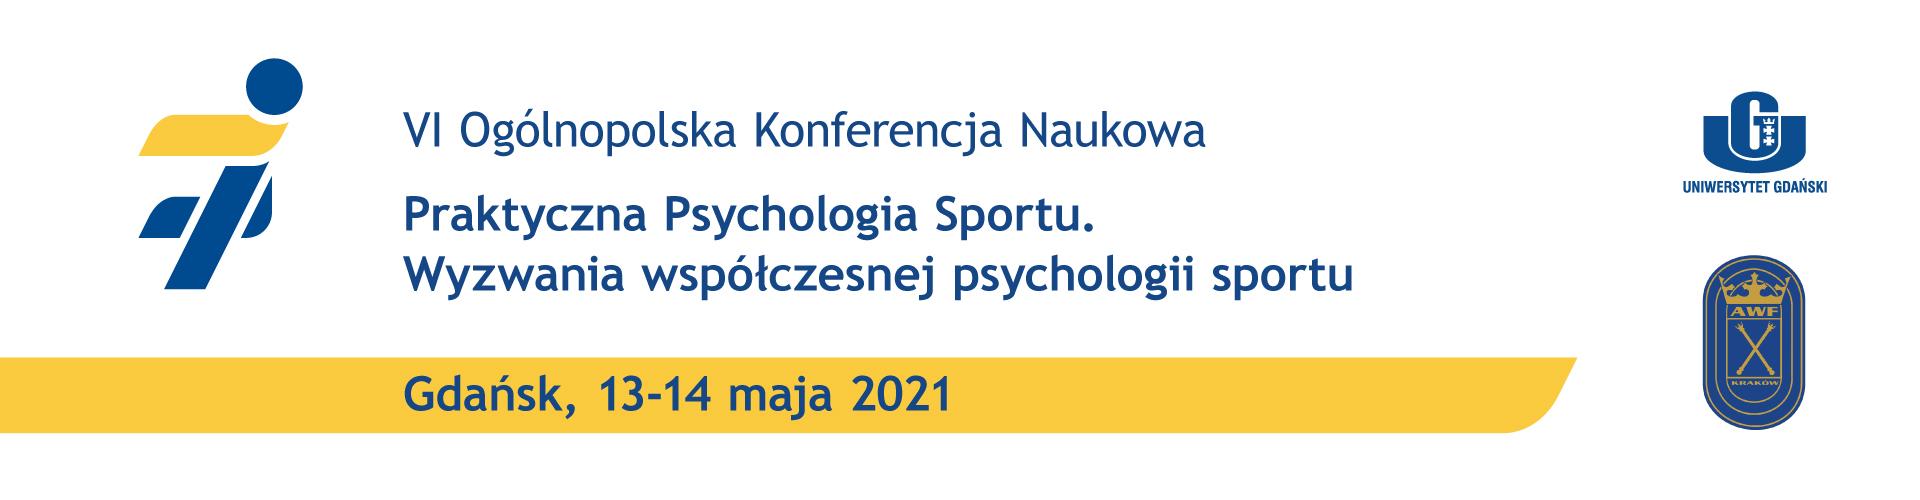 VI konferencja Praktyczna Psychologia Sportu